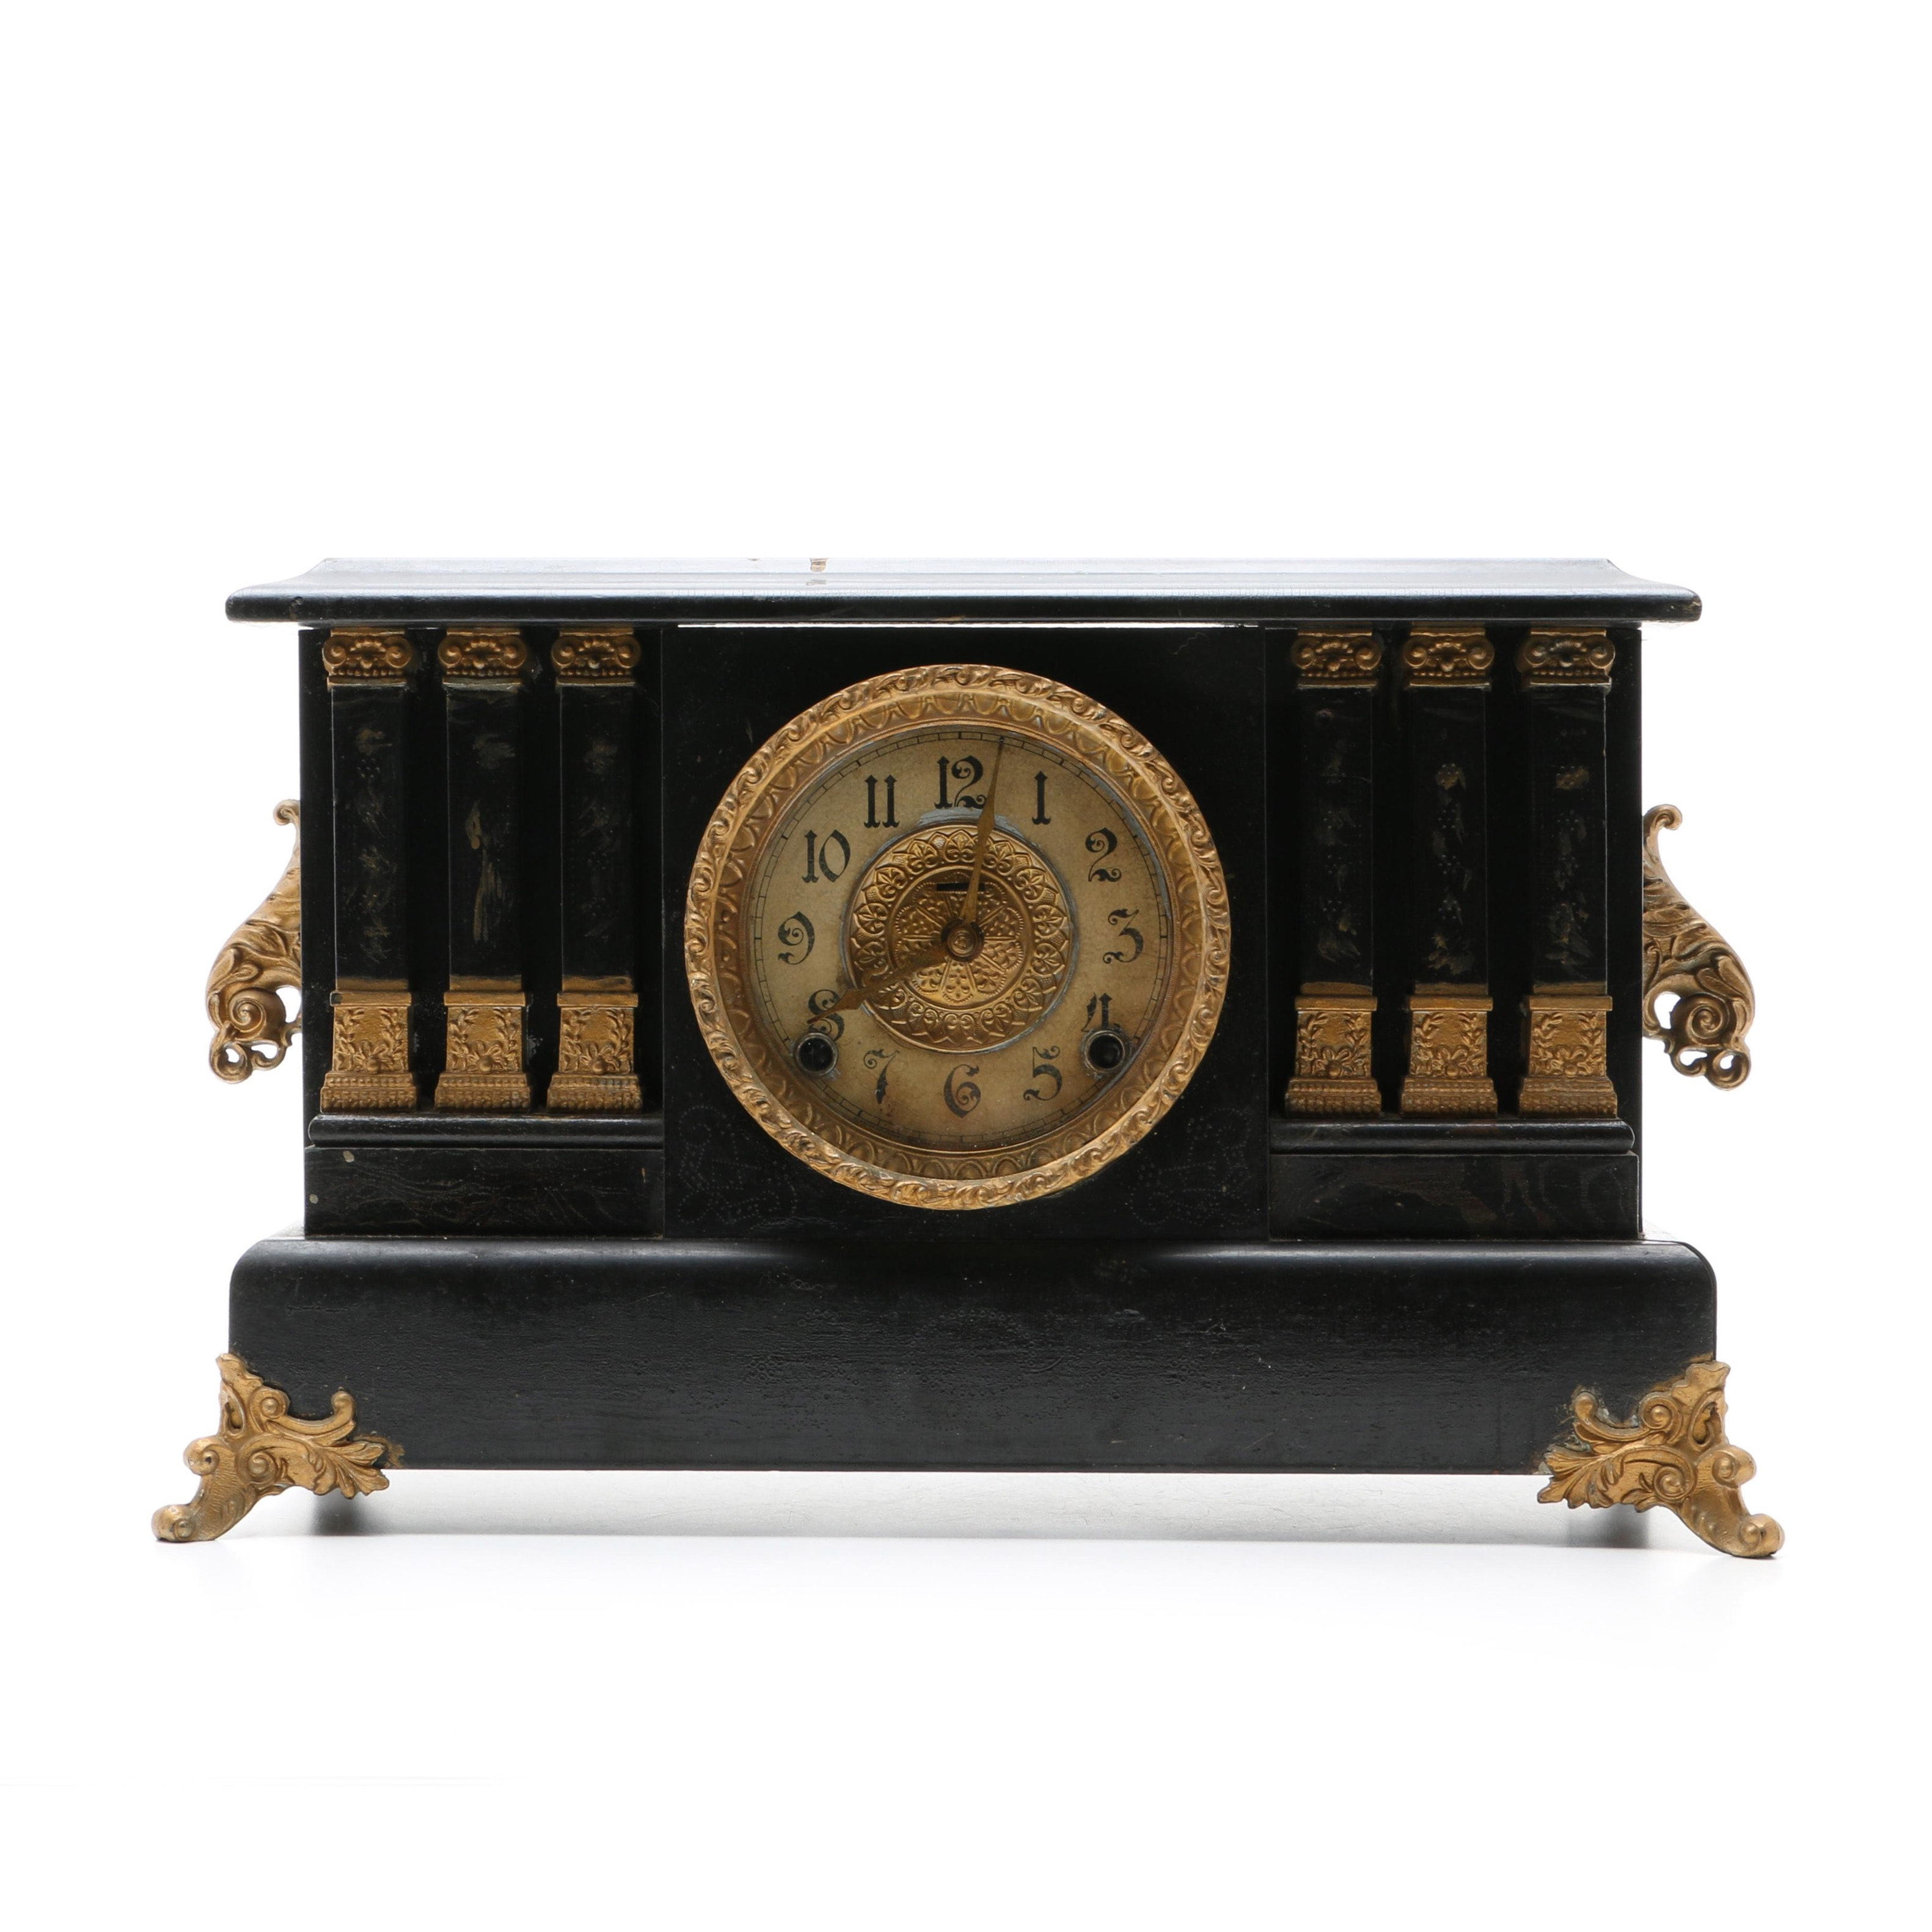 Early 20th Century Ingram Co. Mantel Clock